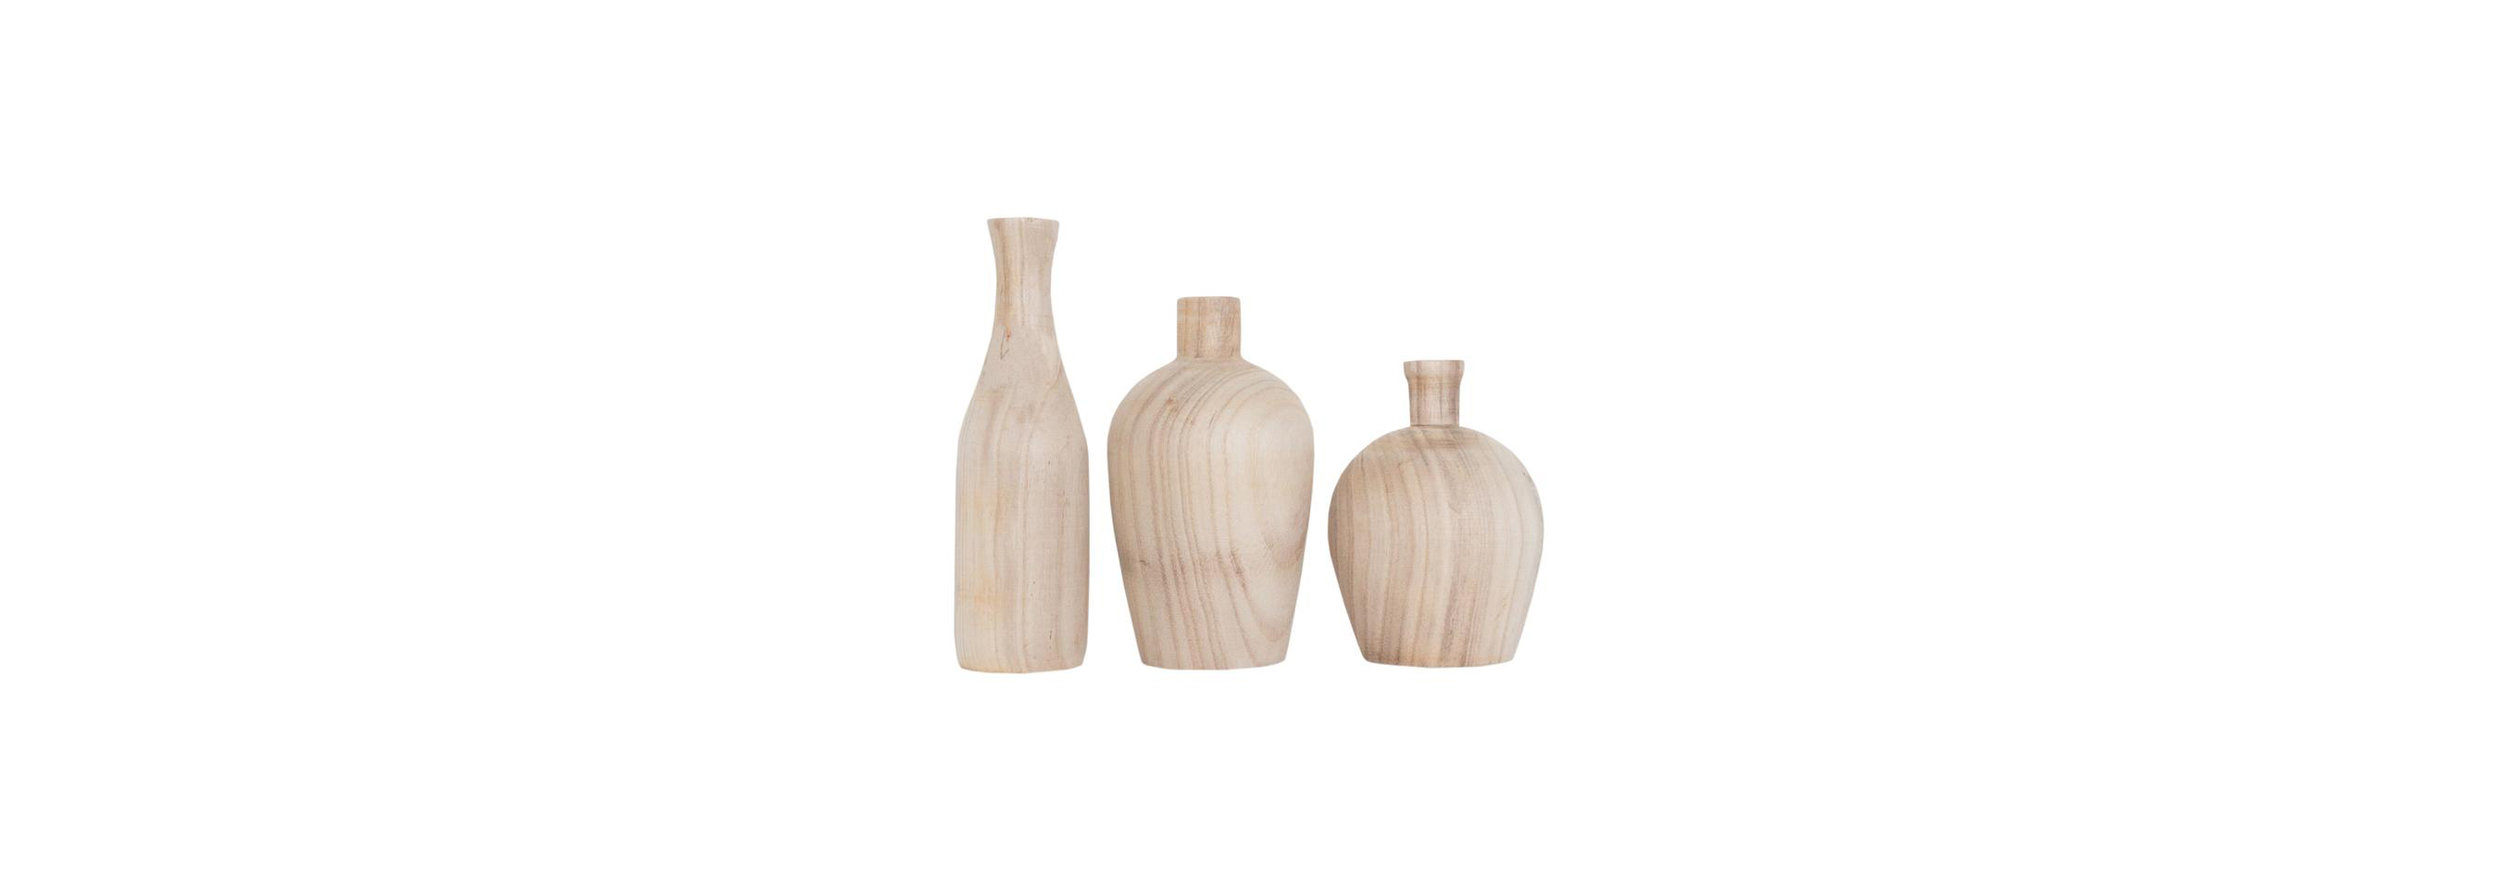 Wooden_Sculpture_Vase_1_960x960.jpg